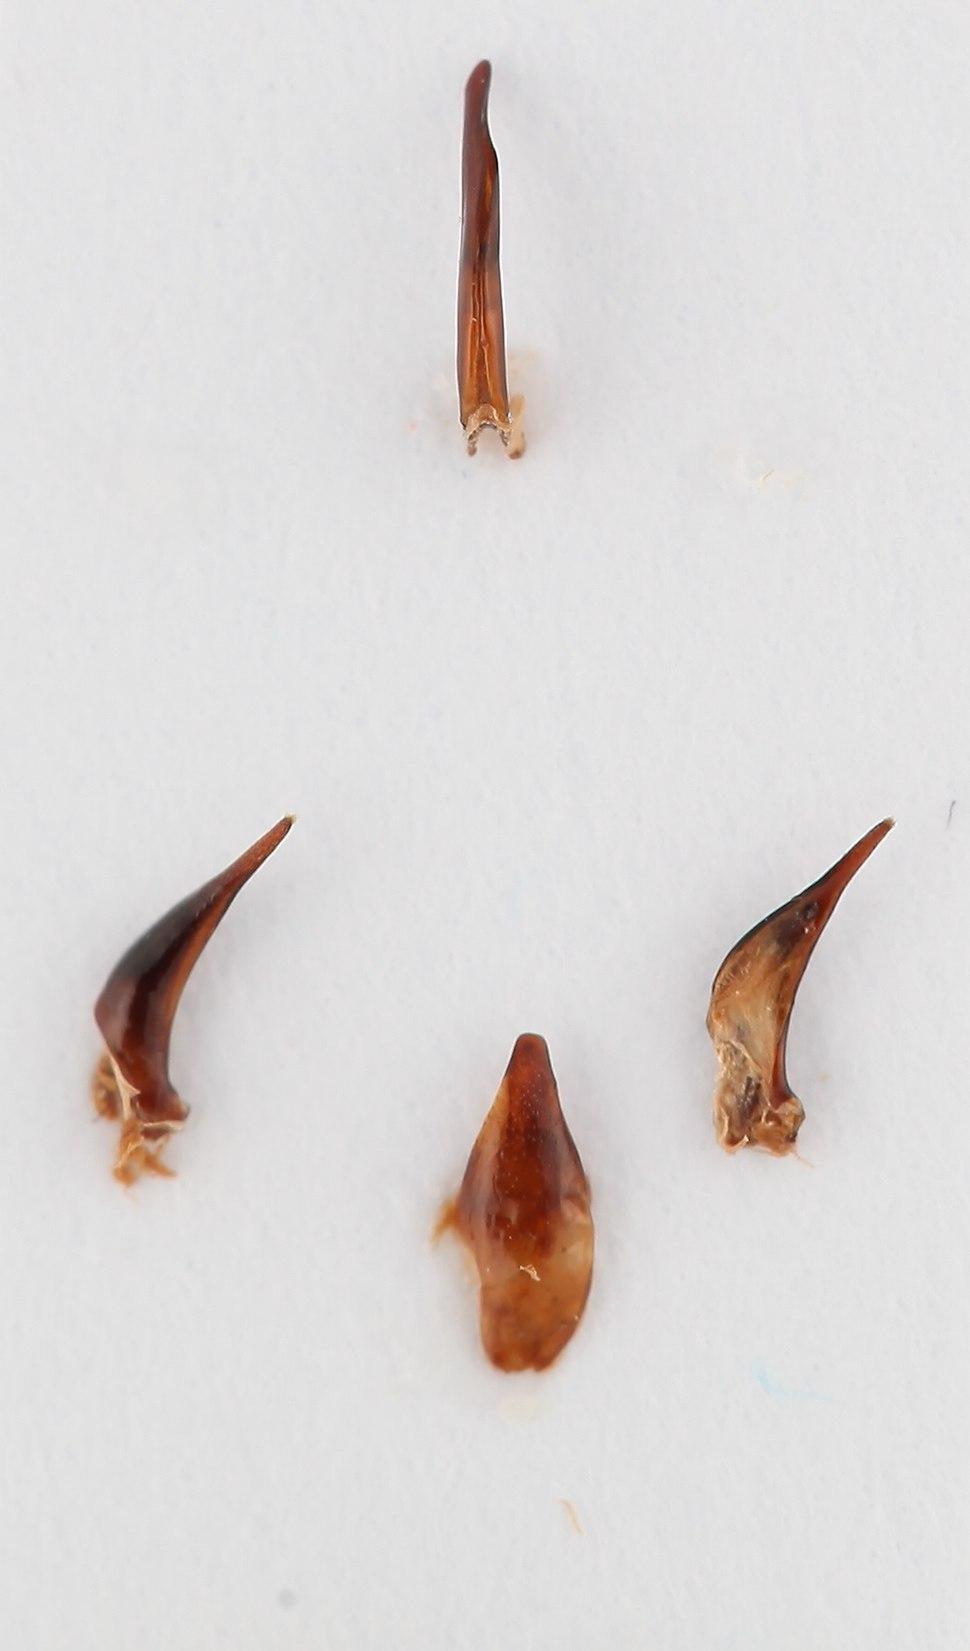 Amphizoagenitalia